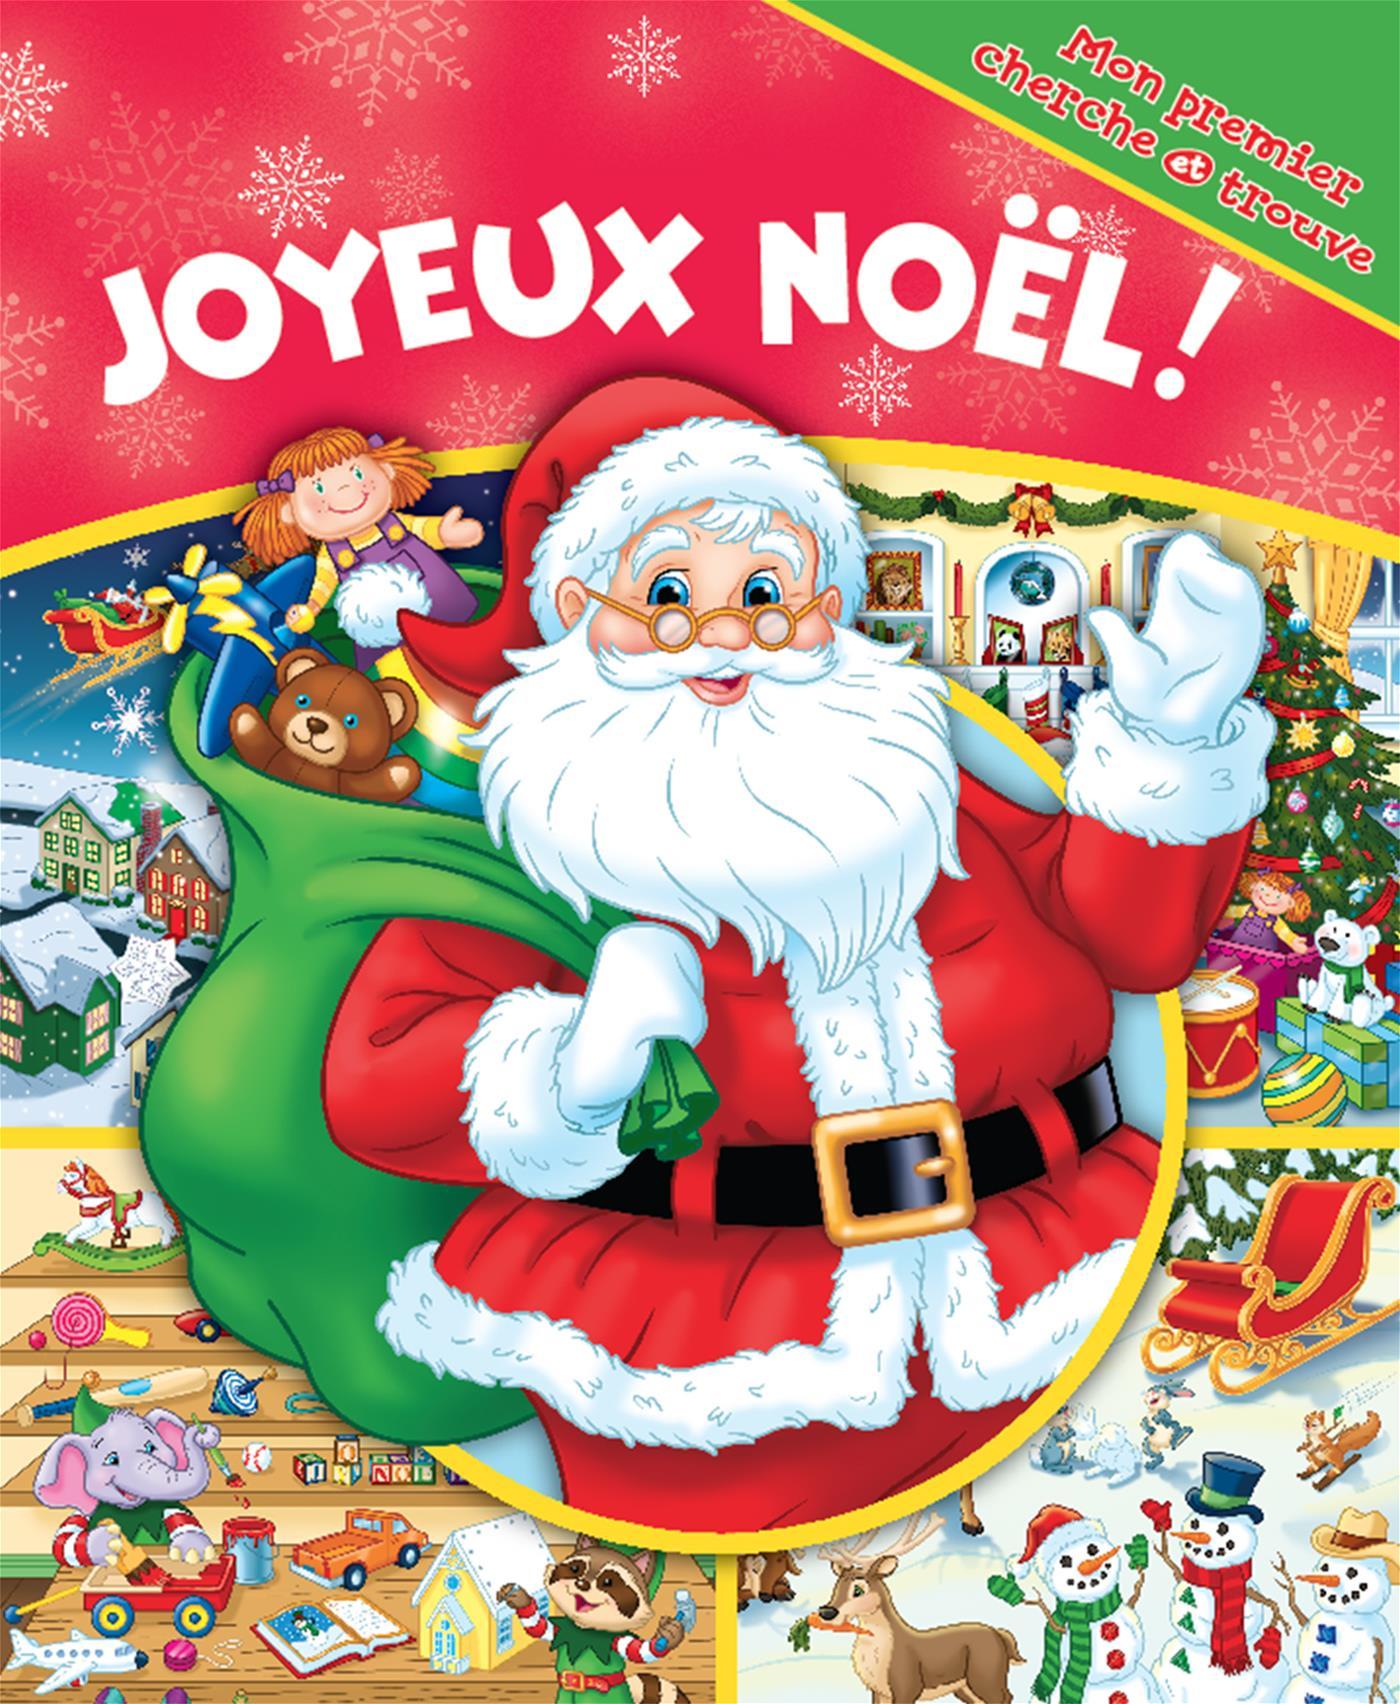 Frais Image Joyeux Noel A Imprimer